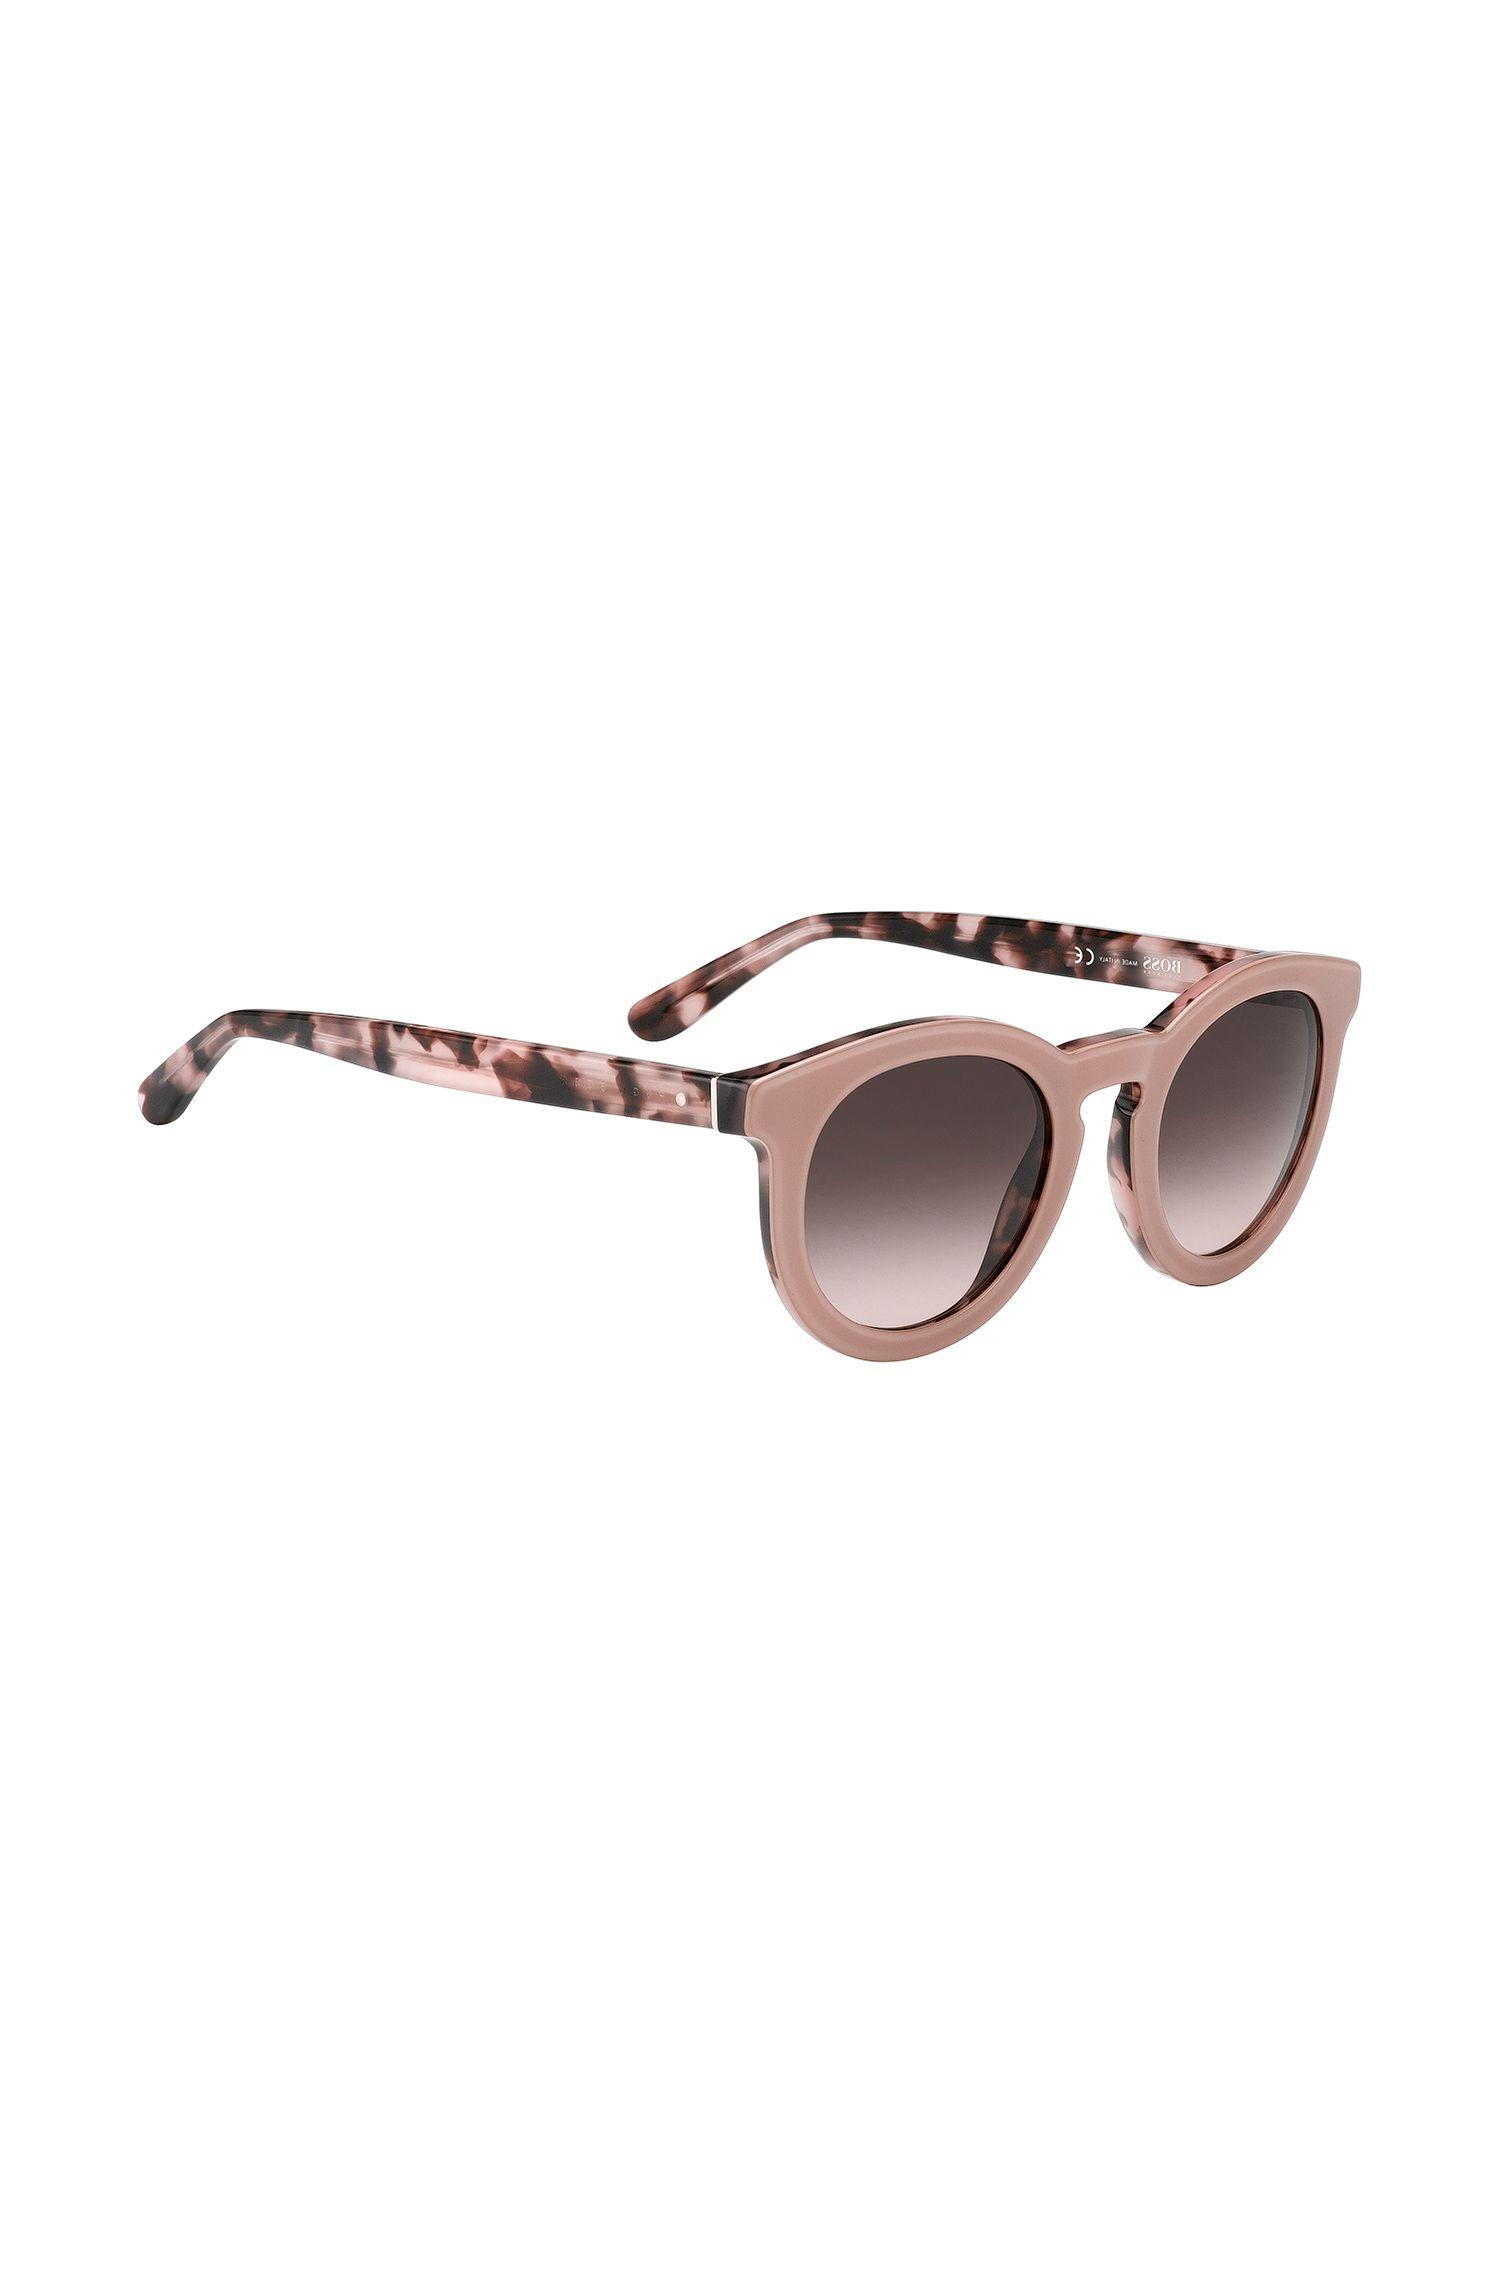 Gafas de sol: 'BOSS 0742/S'